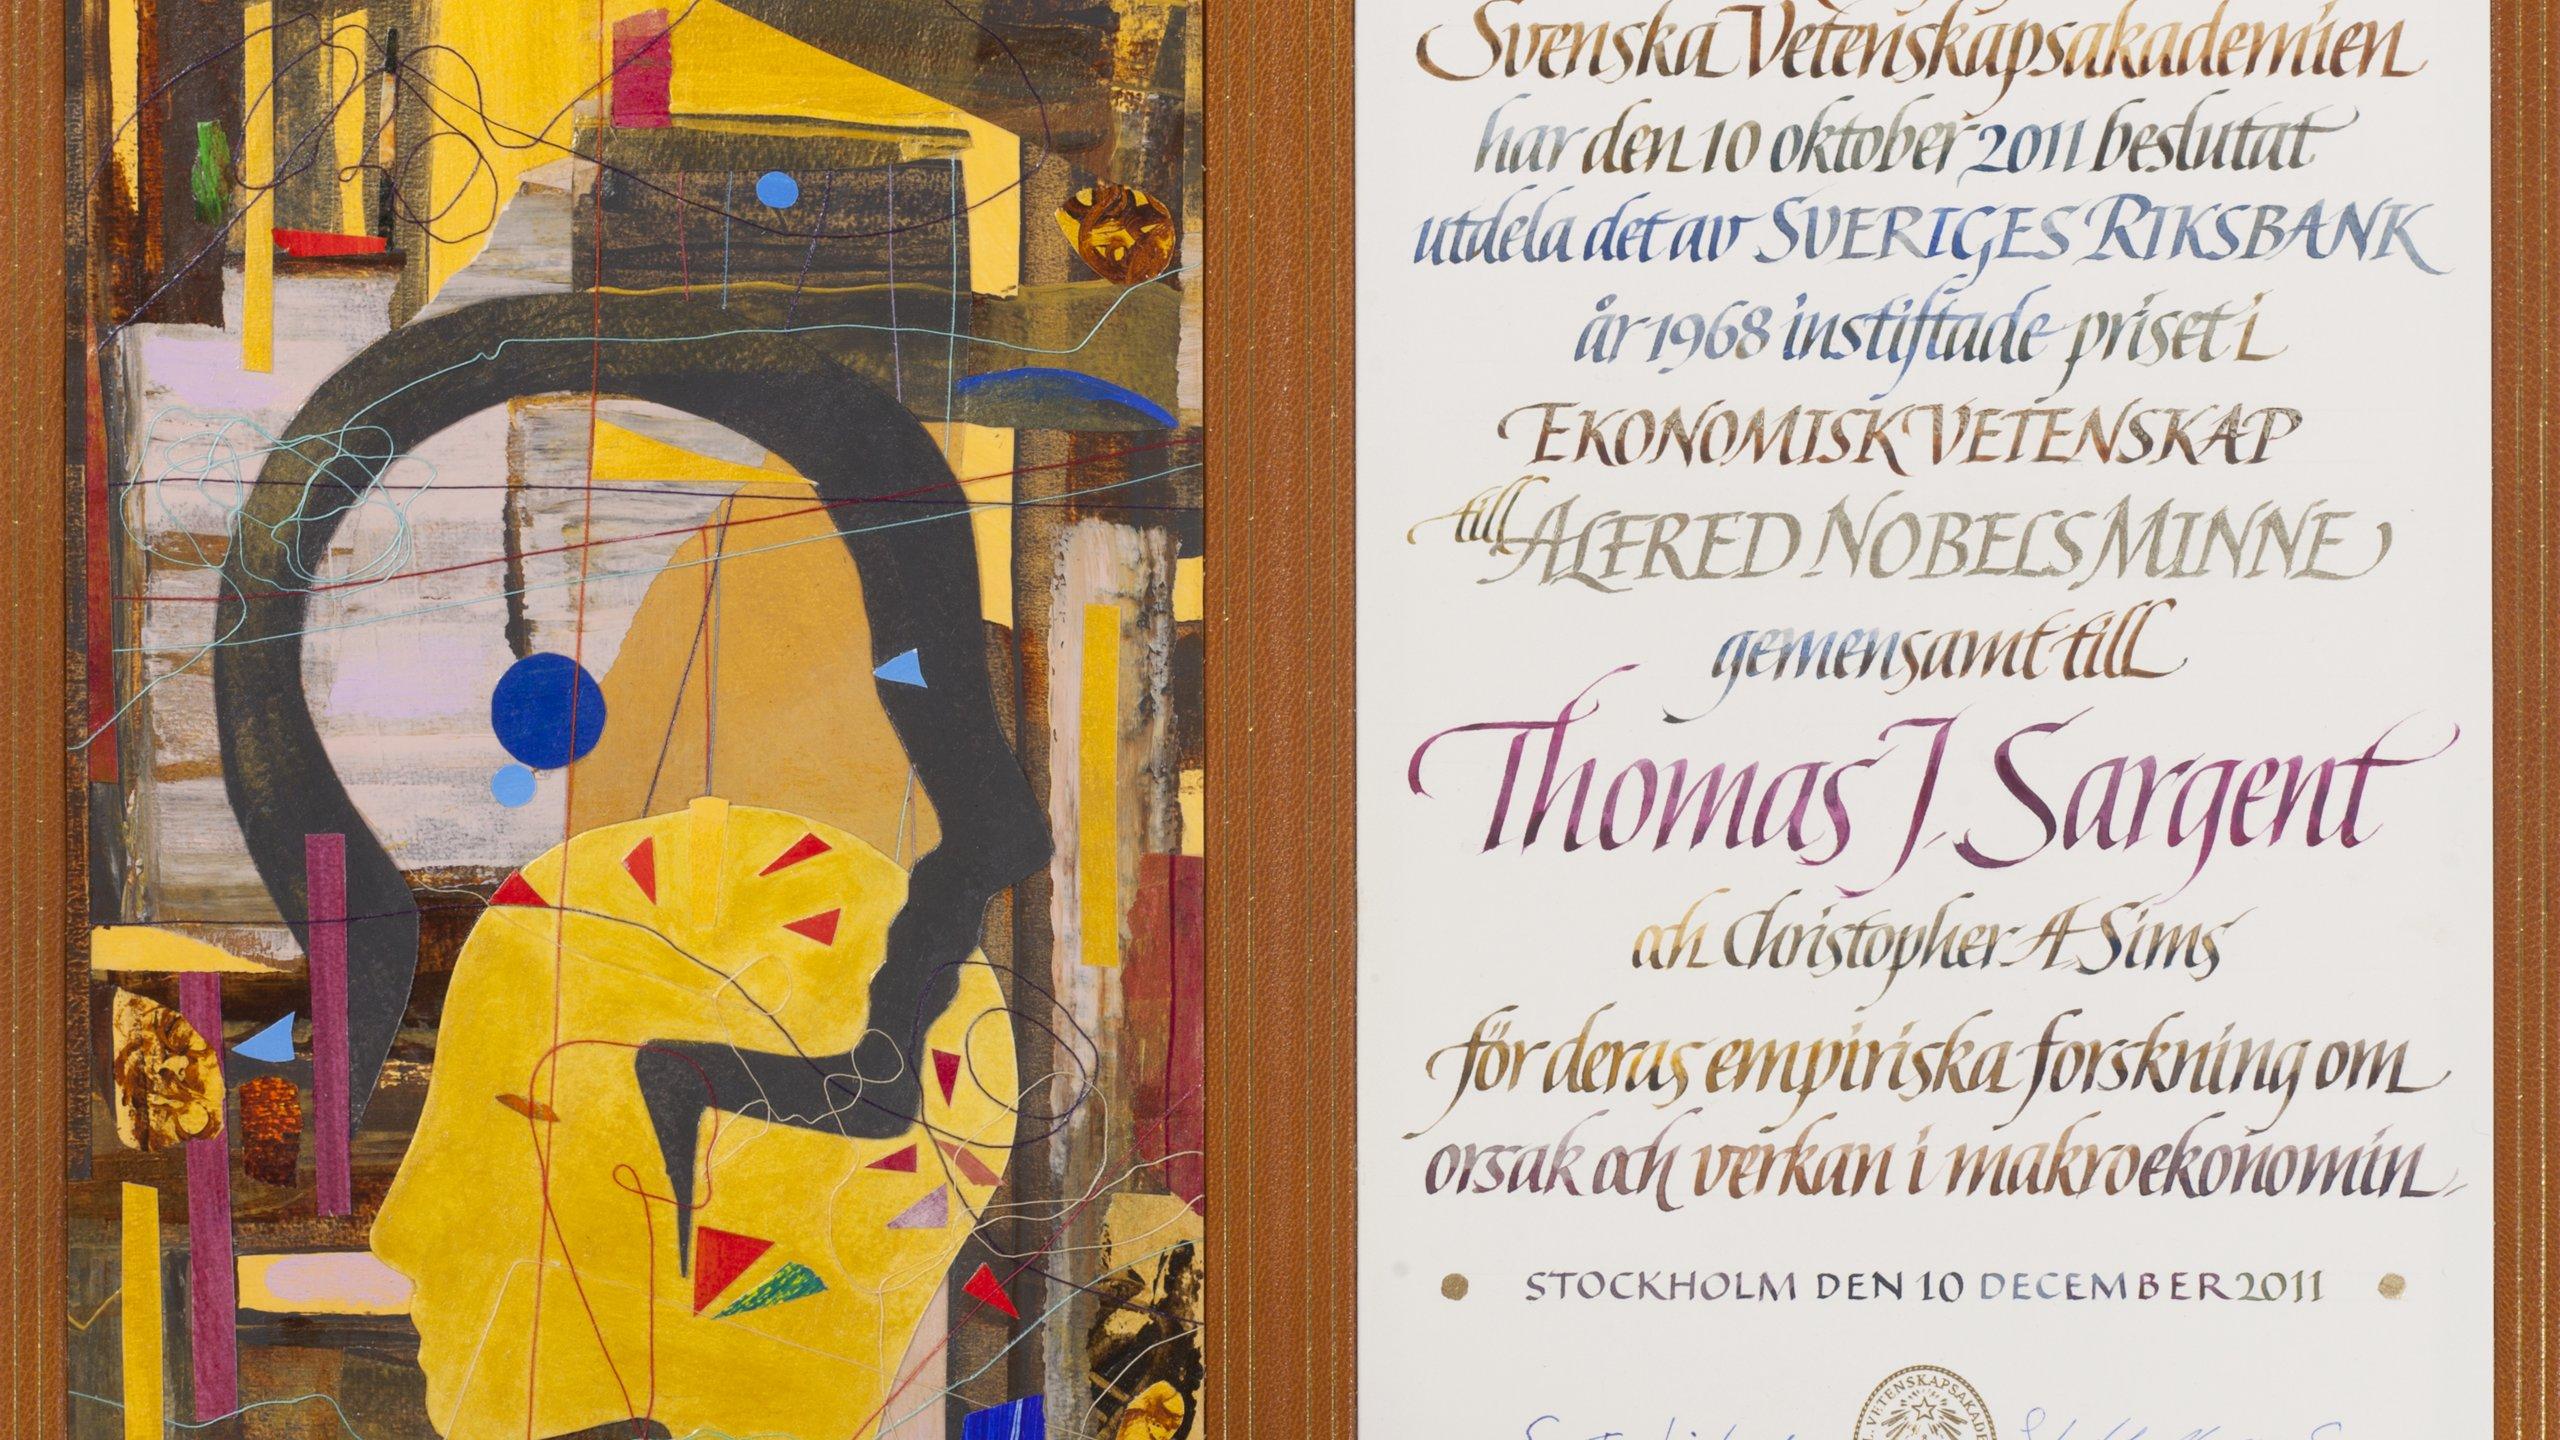 Thomas J. Sargent - Nobel Diploma